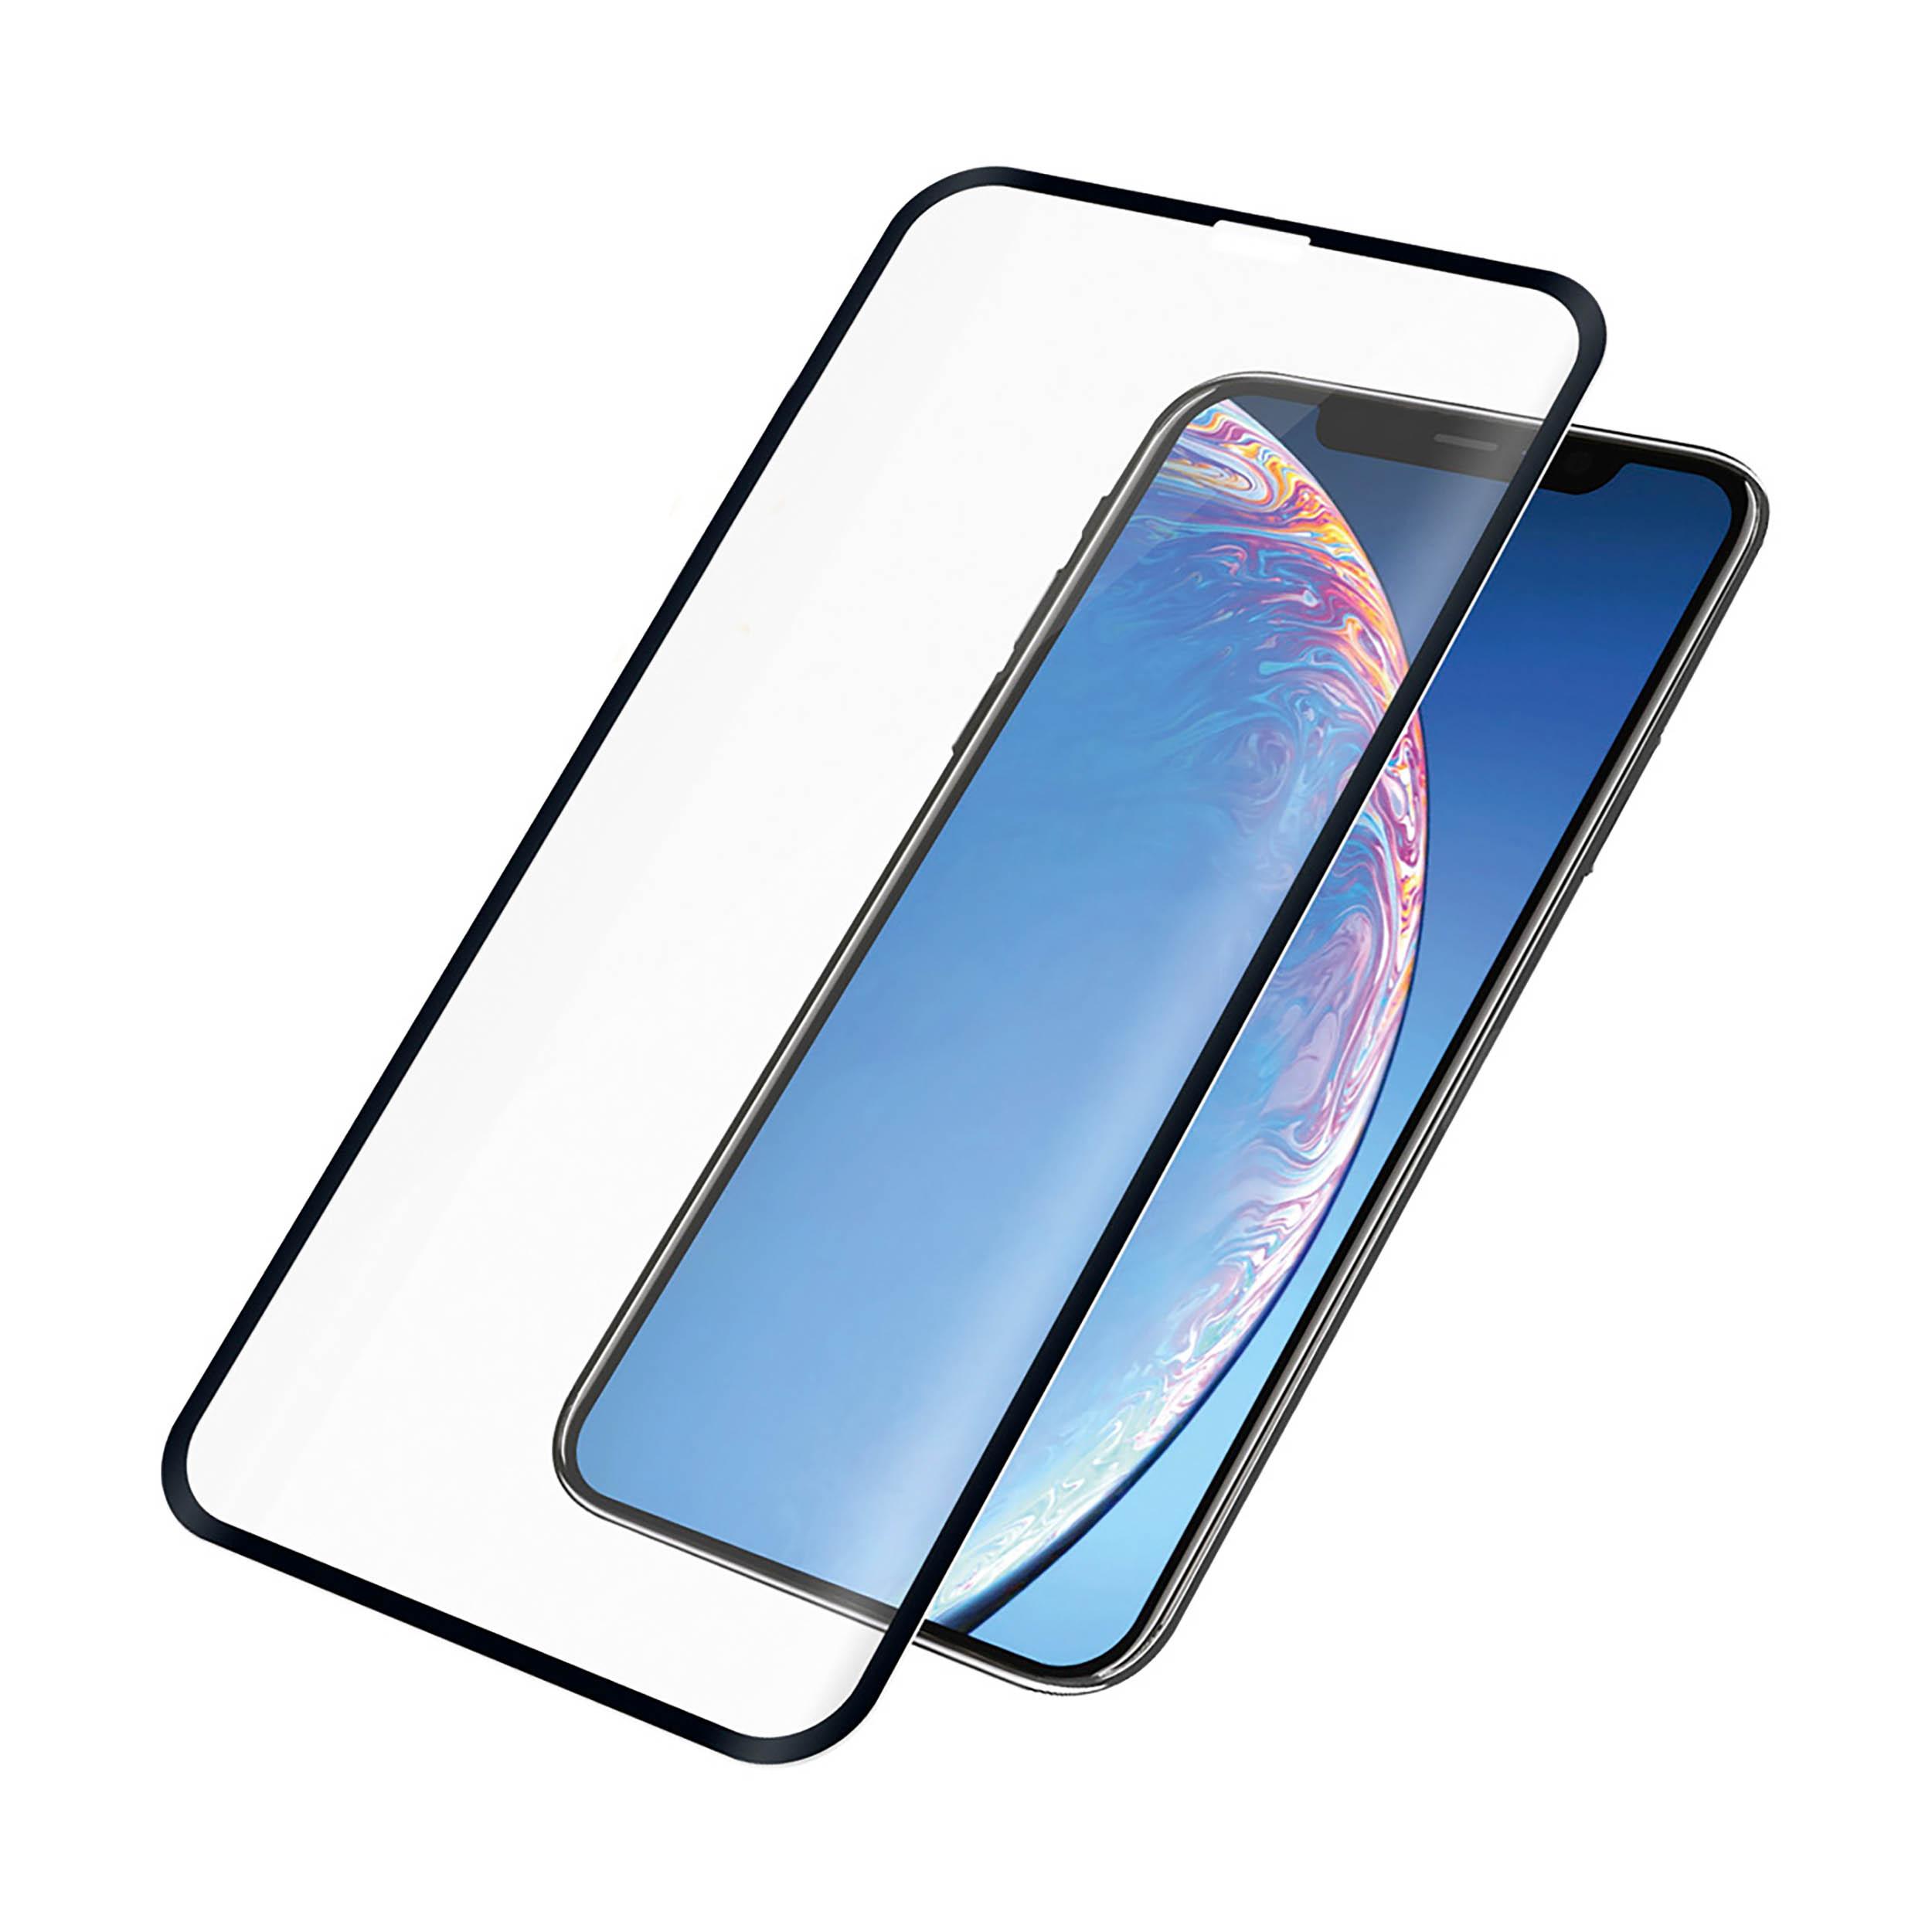 Glas PanzerGlass CE iPhone 11 Pro Max, Xs Max, schwarzer Rahmen    Guerteltier